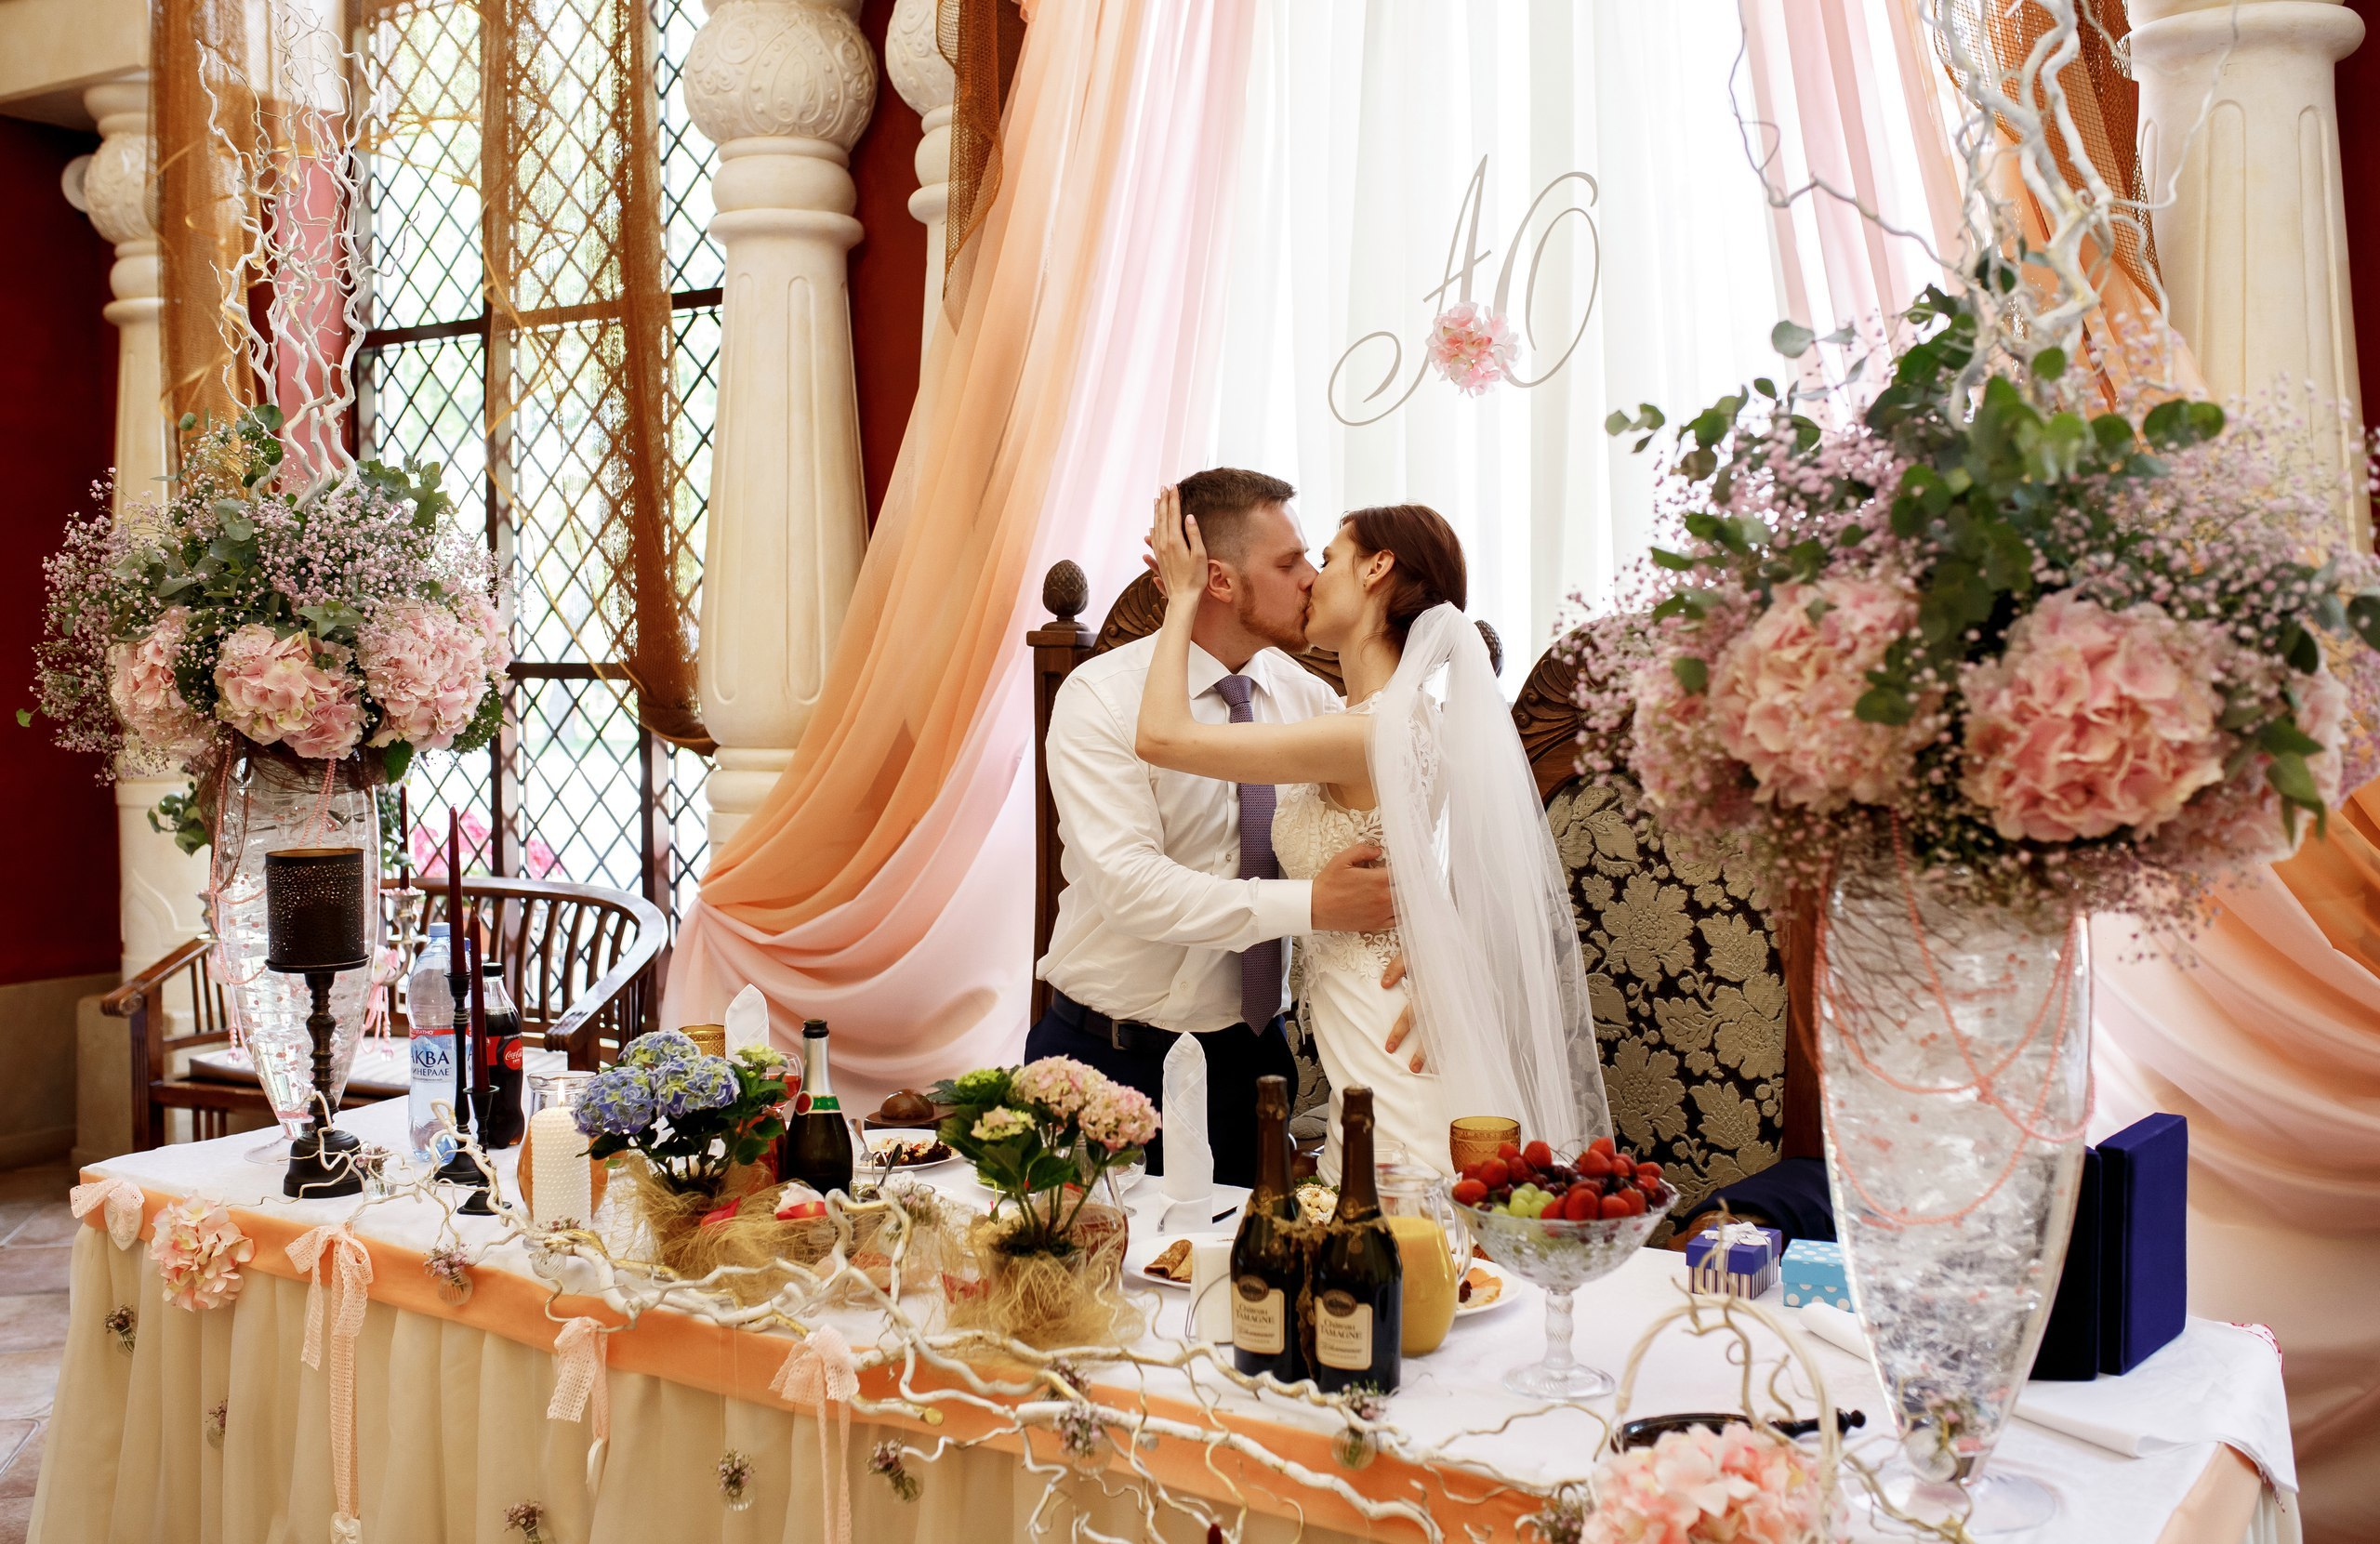 Свадьба в некотором царстве фото